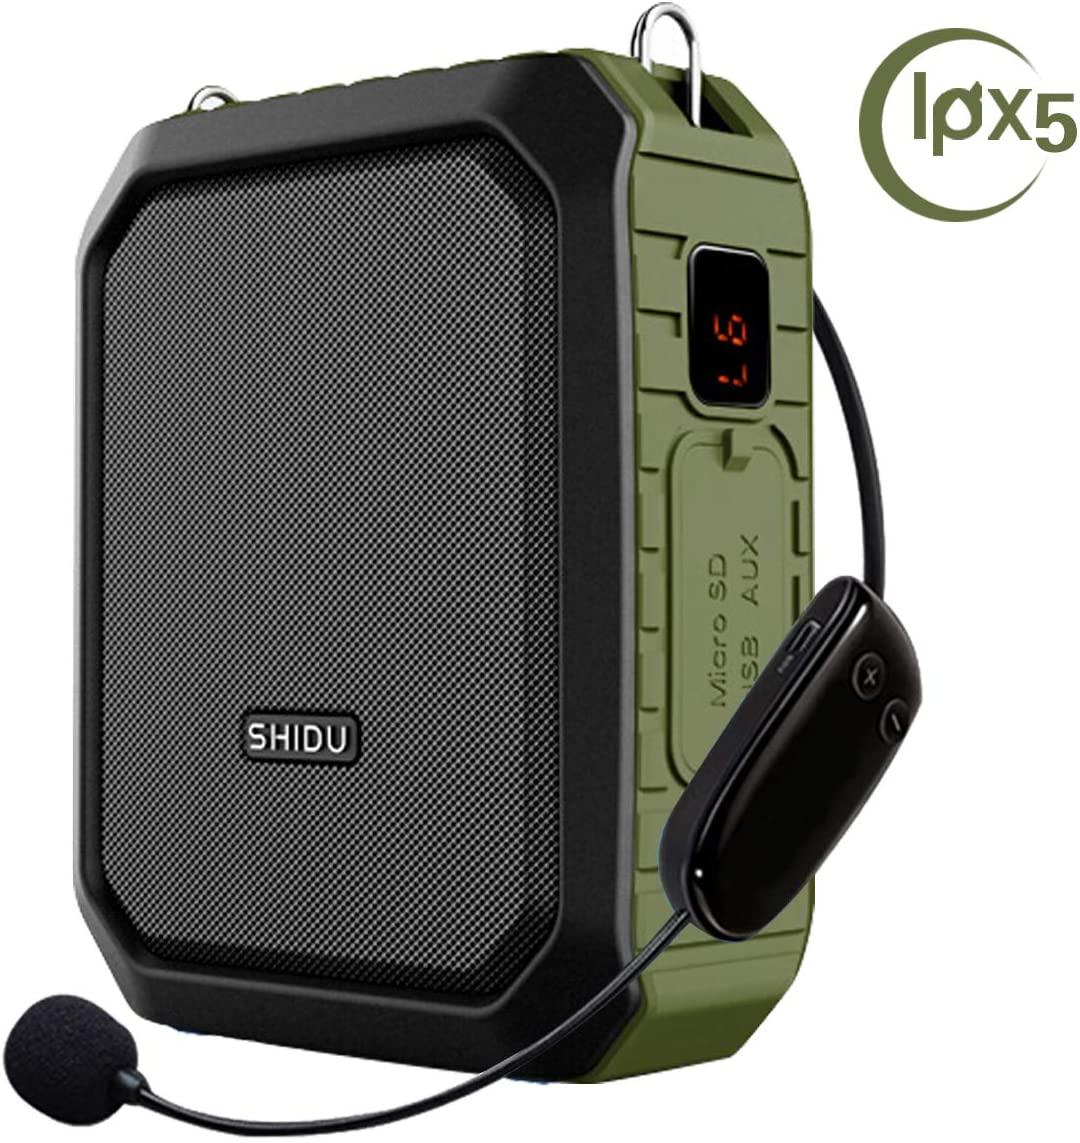 Wireless Voice Amplifier with Headset Mic 18W Voice Loudspeaker Portable Bluetooth Speaker Waterproof IPX5 Power Bank for Outdoor Activities, Shower, Teachers, Presenter, Salesman etc